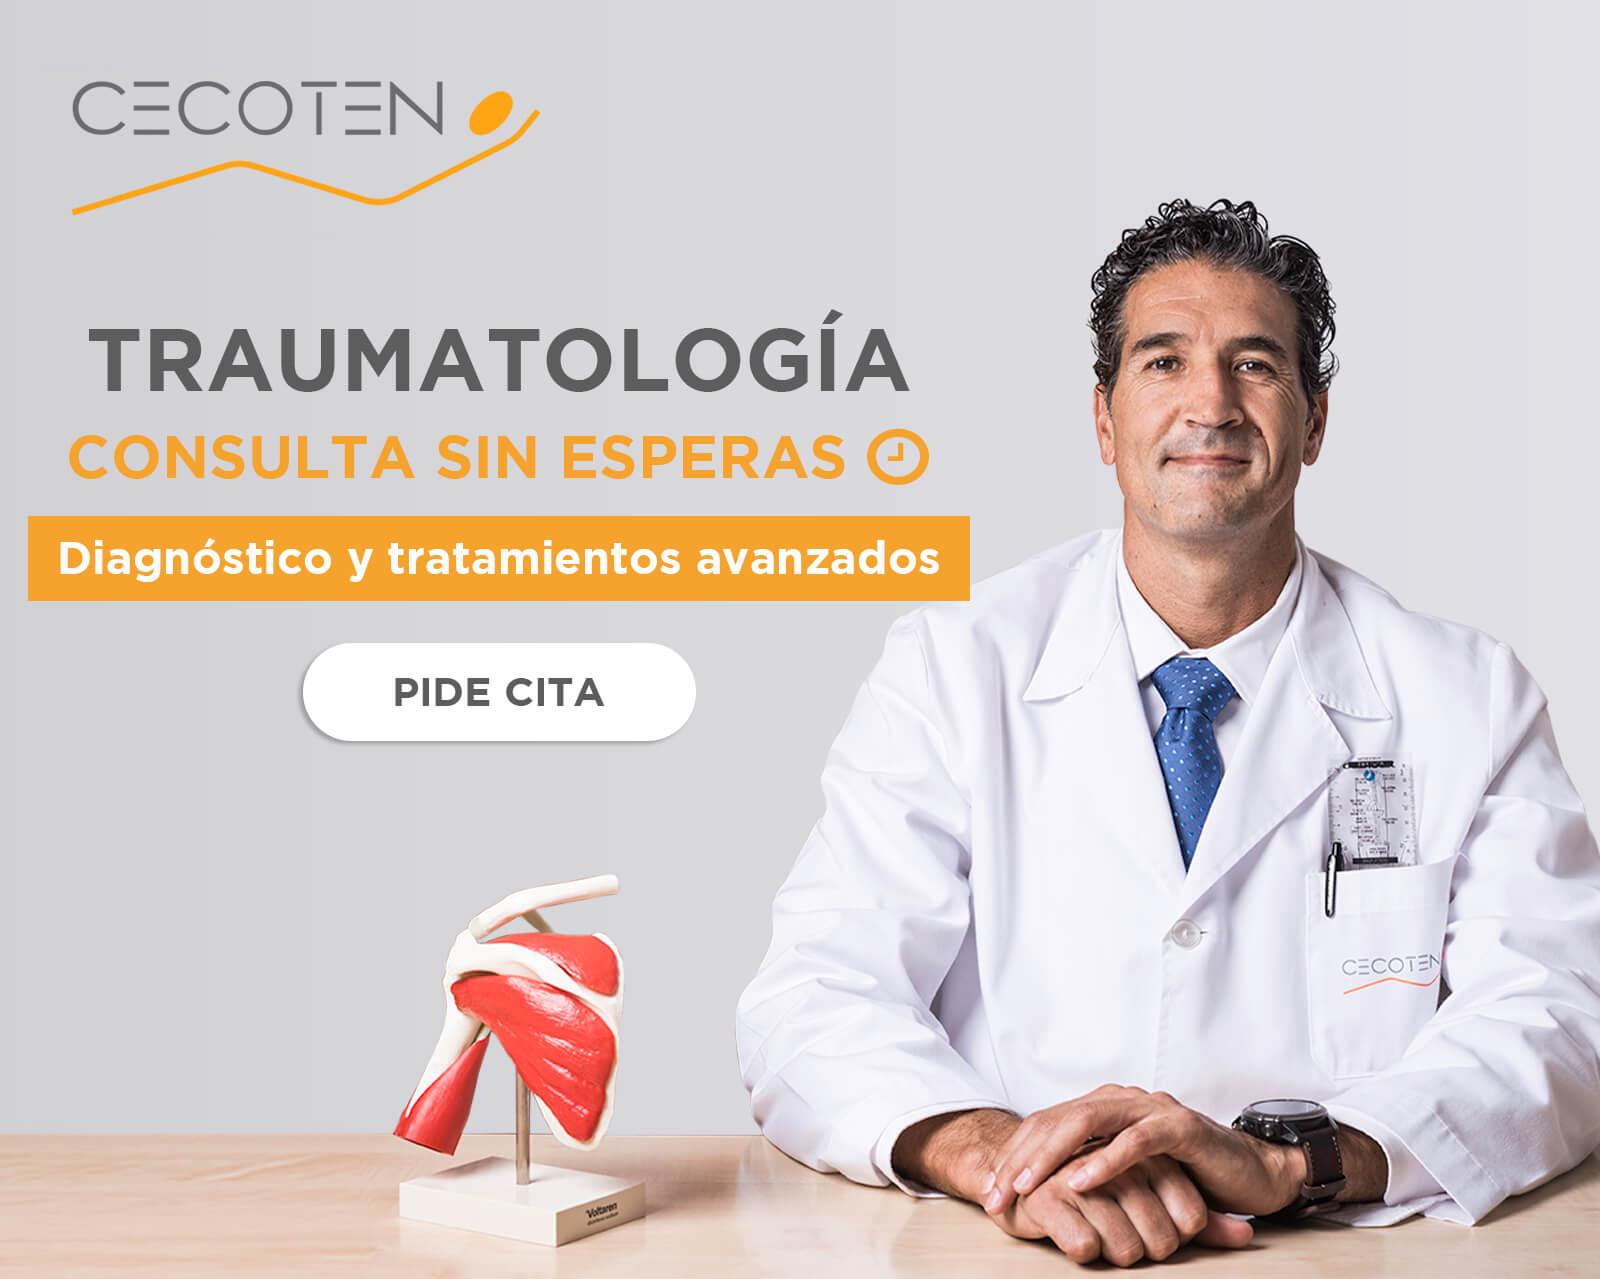 ConsultaTraumatologia